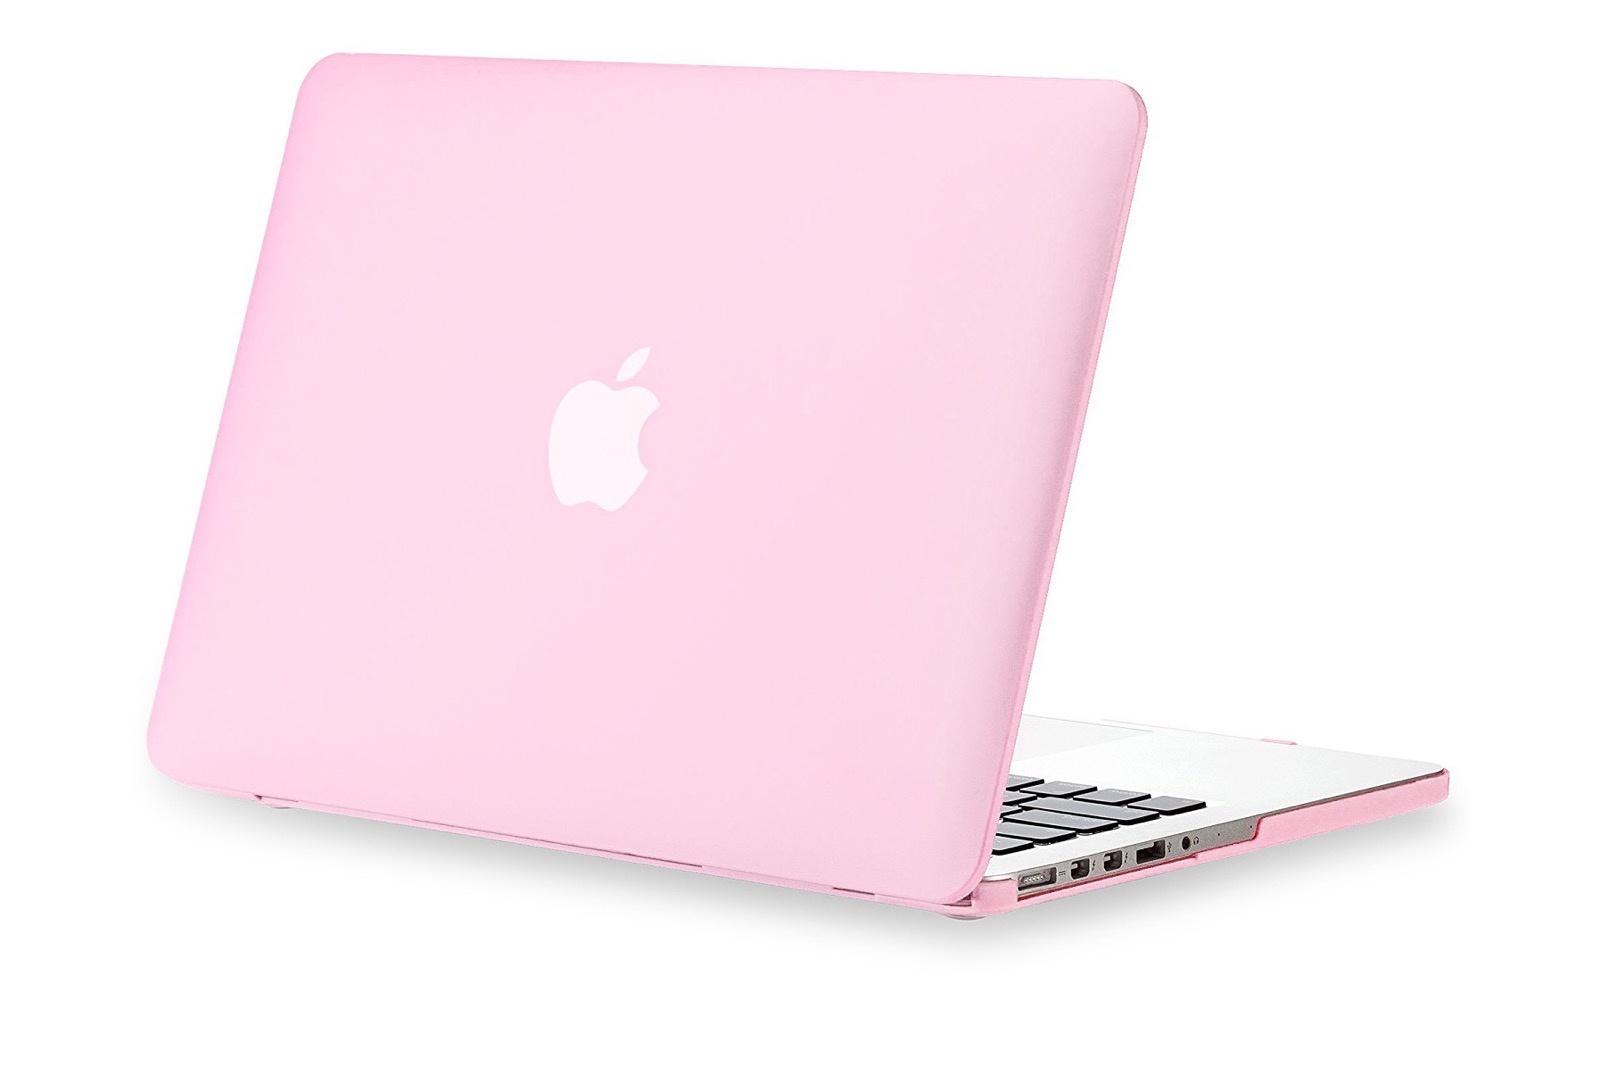 Чехол для ноутбука Gurdini пластик матовый 903062 для MacBook Air 11